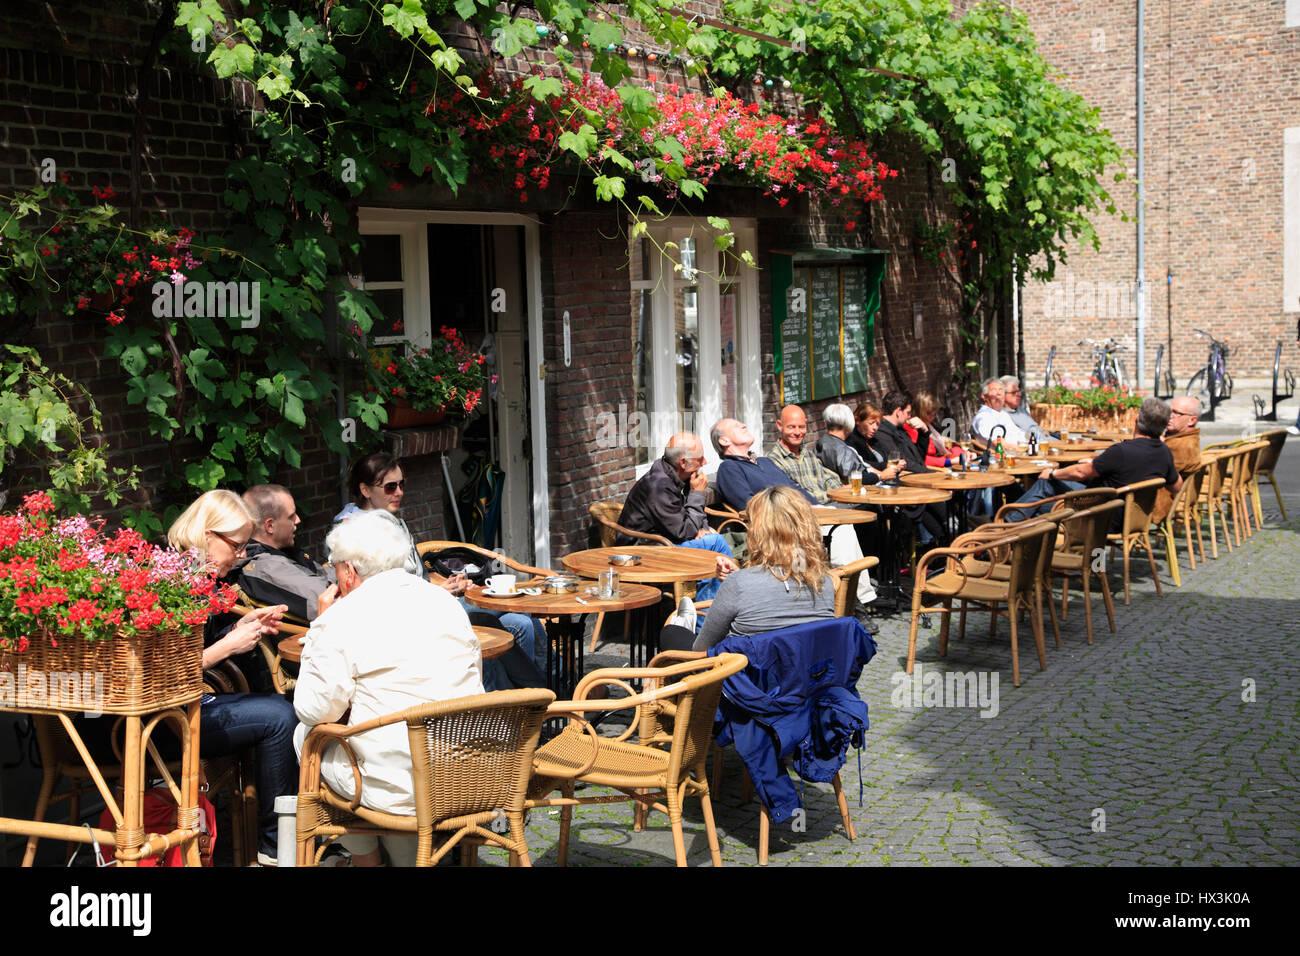 Cafe and bar in Maastricht, Limburg, Netherlands, Europeflowers - Stock Image